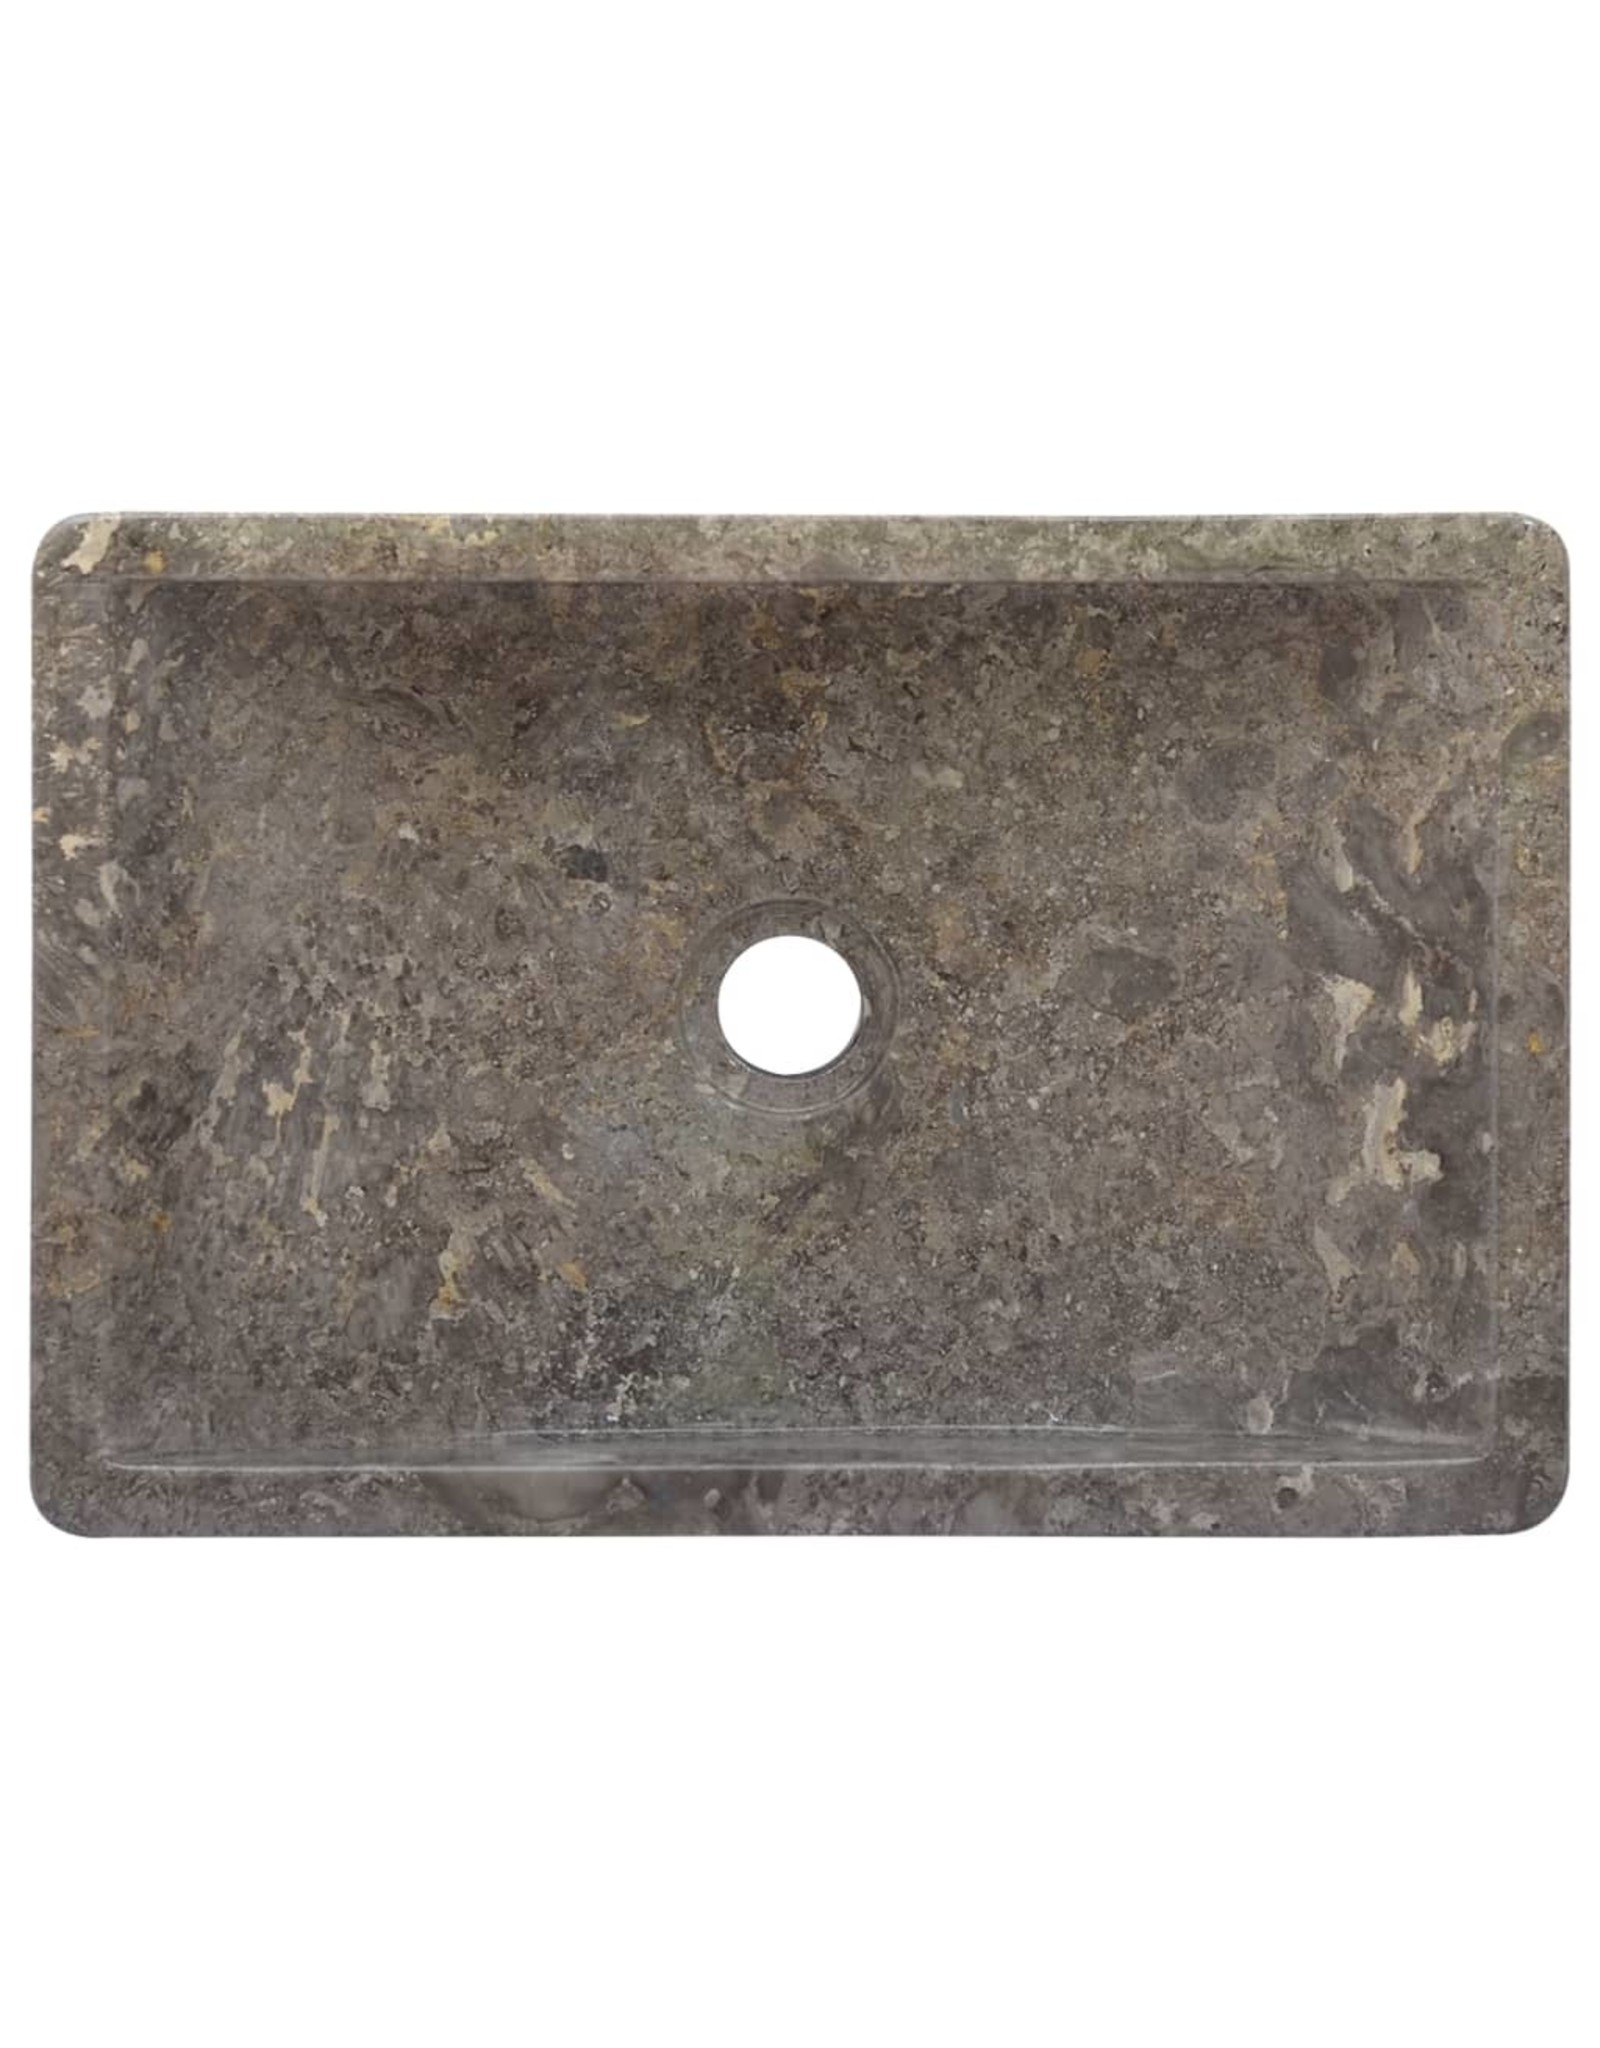 Gootsteen 45x30x12 cm marmer grijs